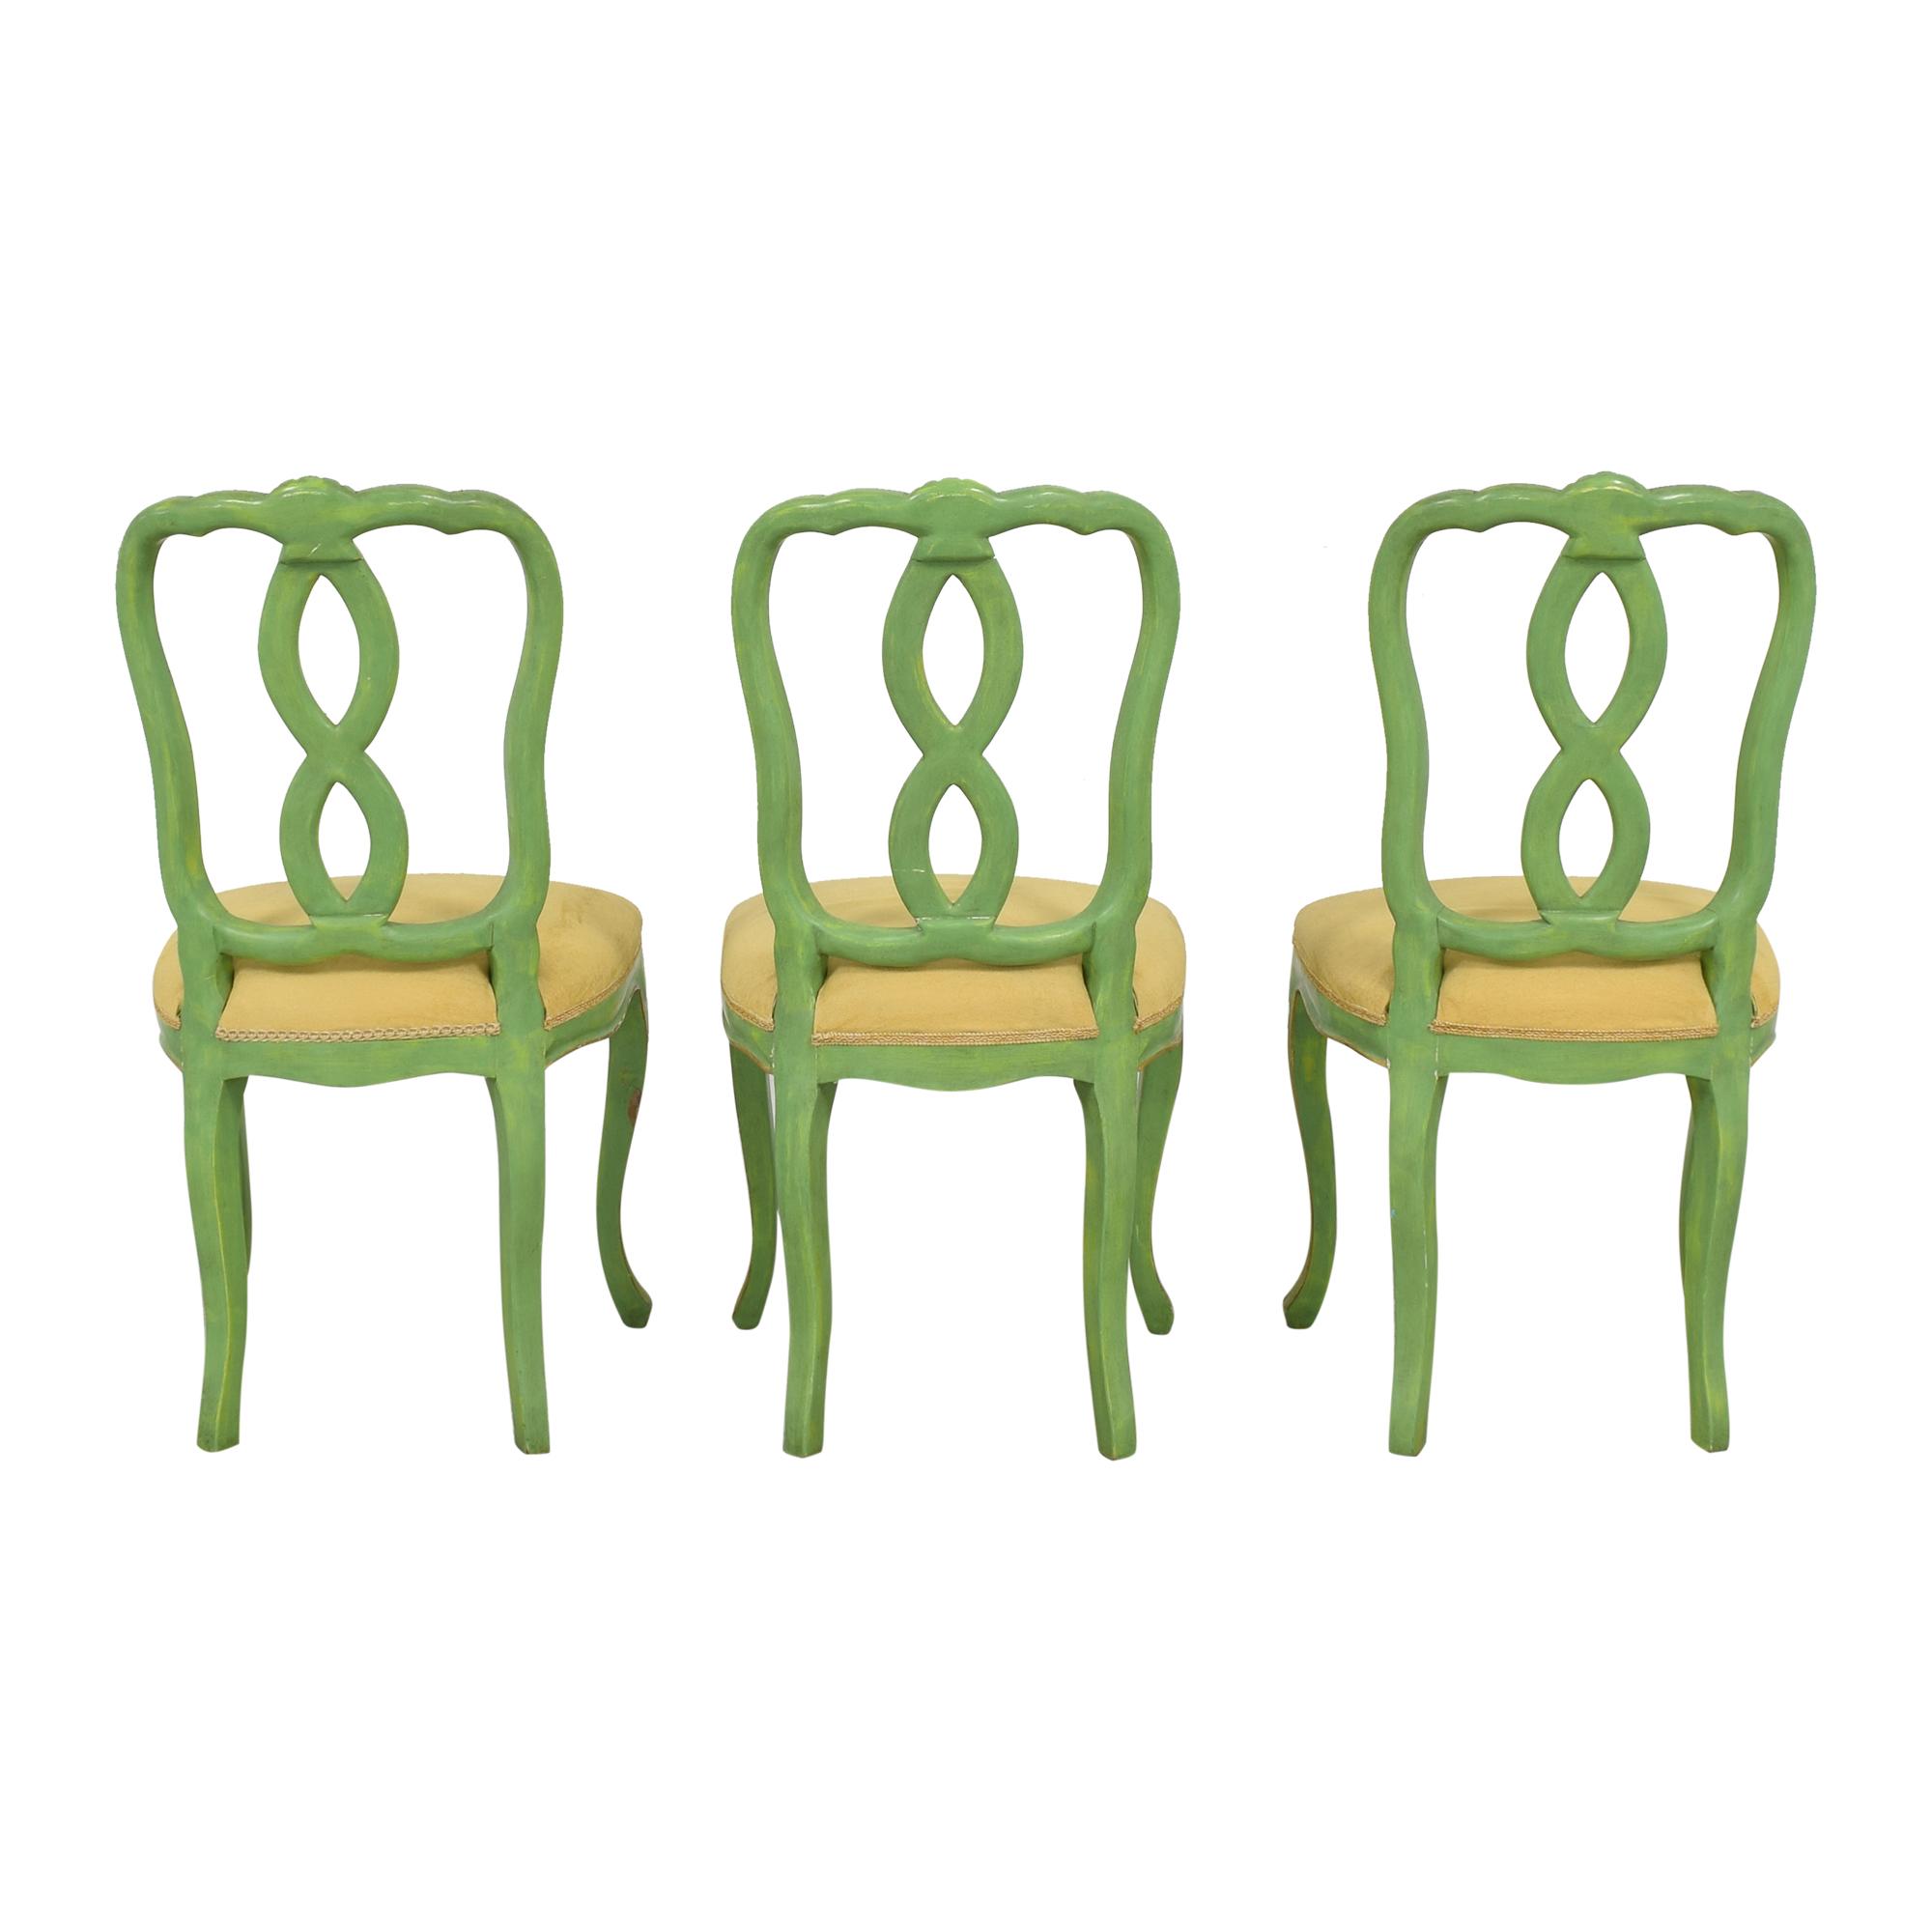 Bergdorf Goodman Bergdorf Goodman Green and Gold Chairs beige